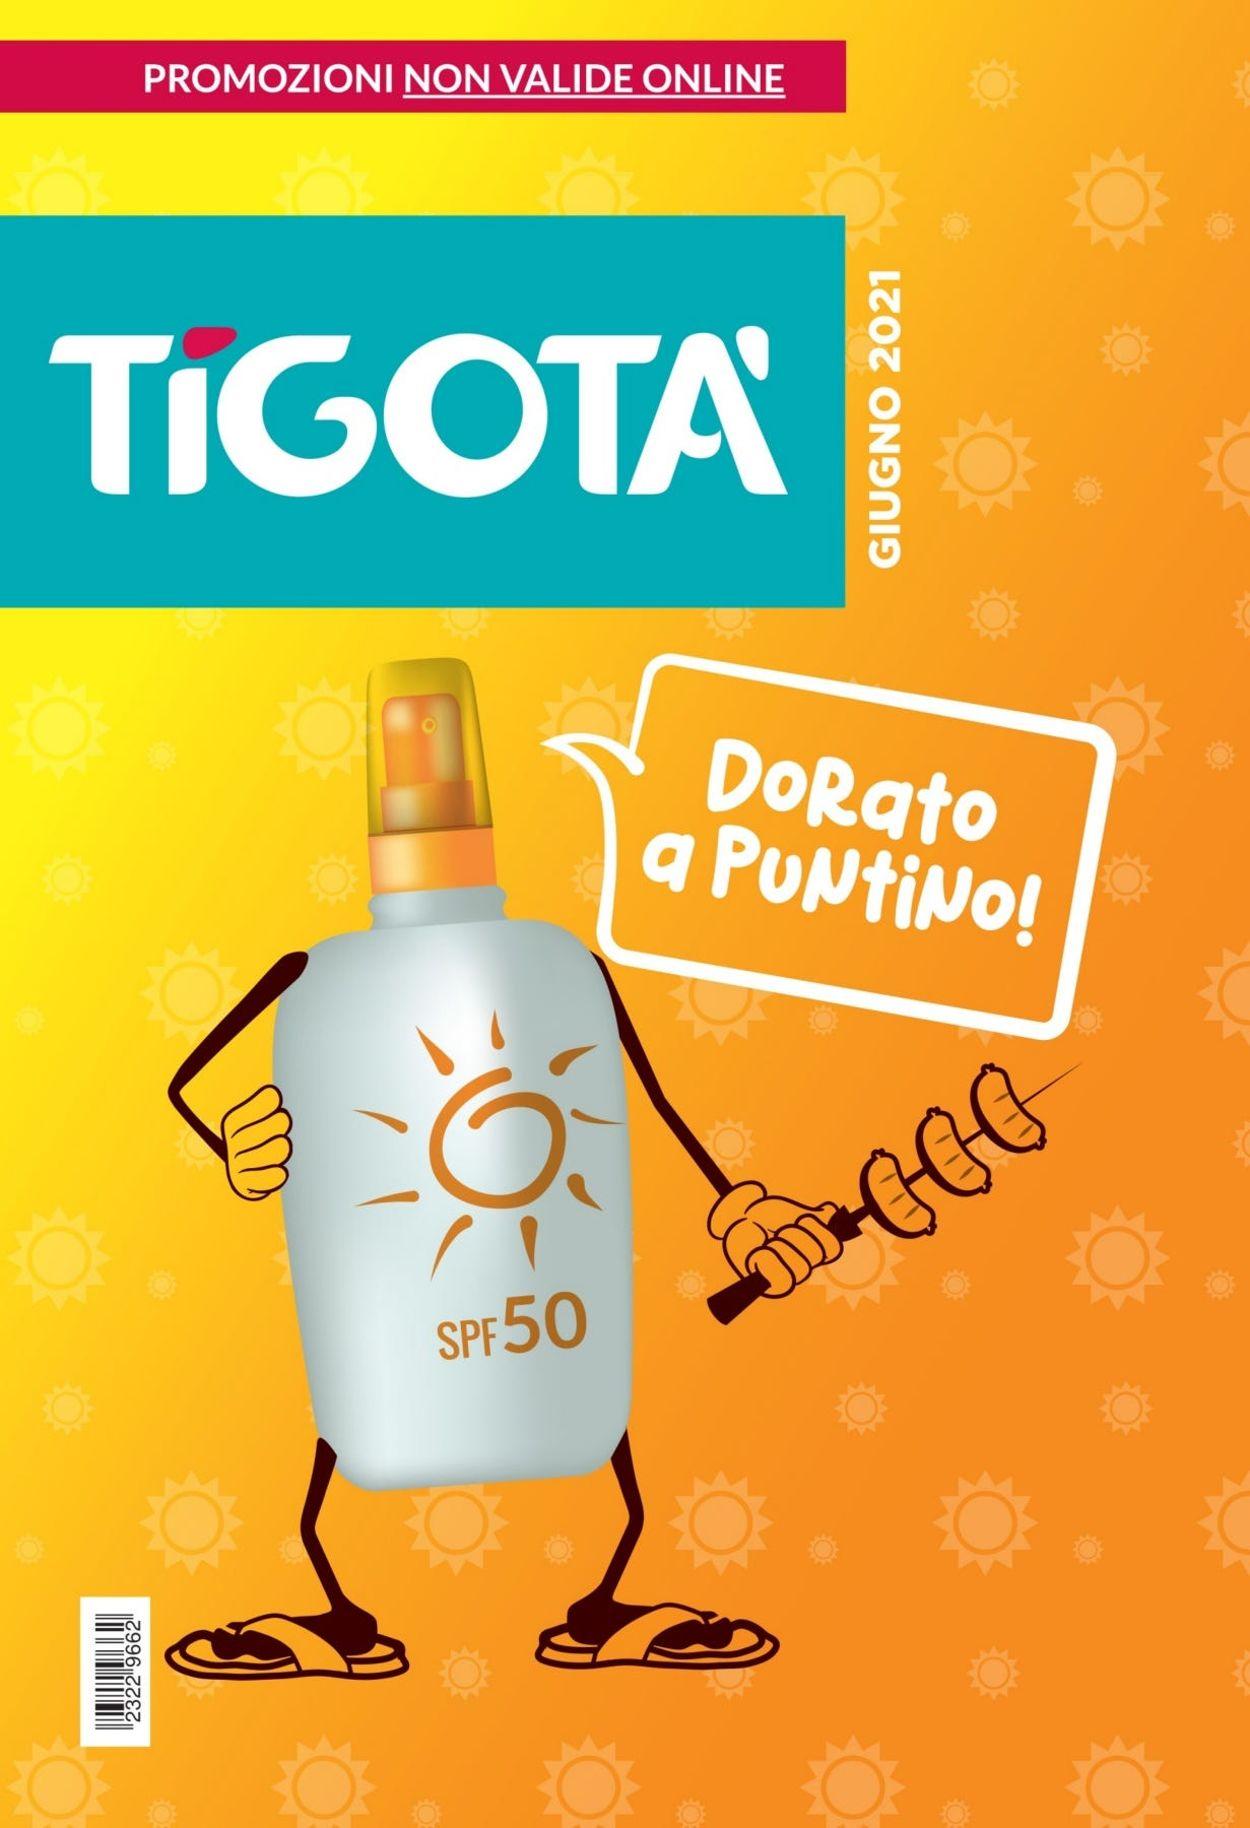 Volantino Tigotà - Offerte 01/06-30/06/2021